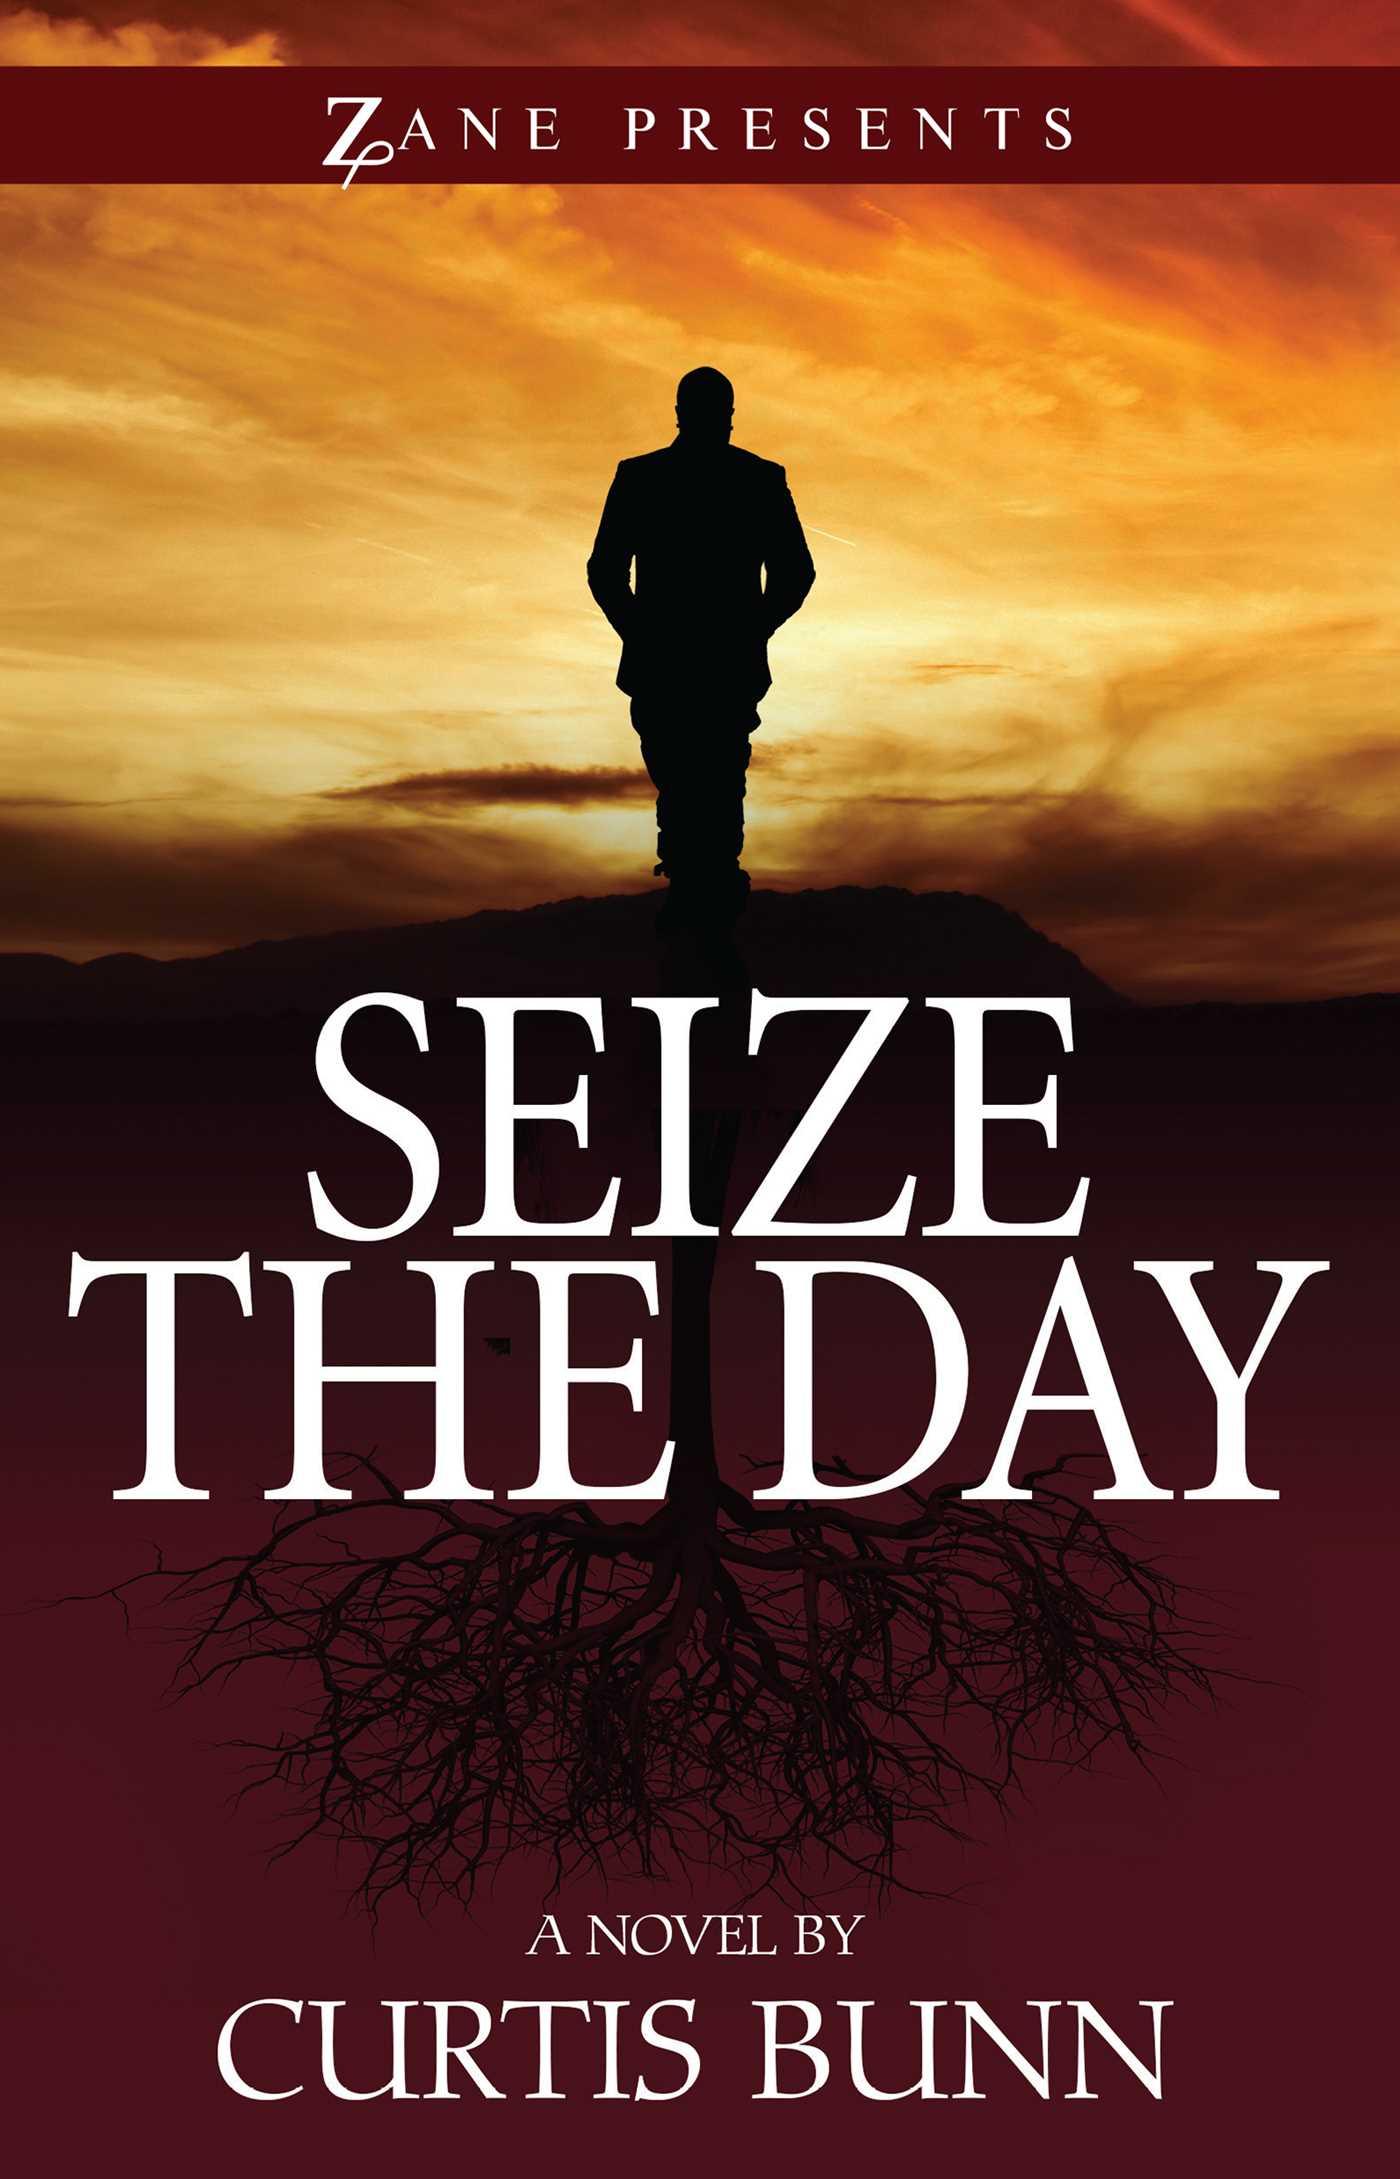 Seize the day 9781593095741 hr